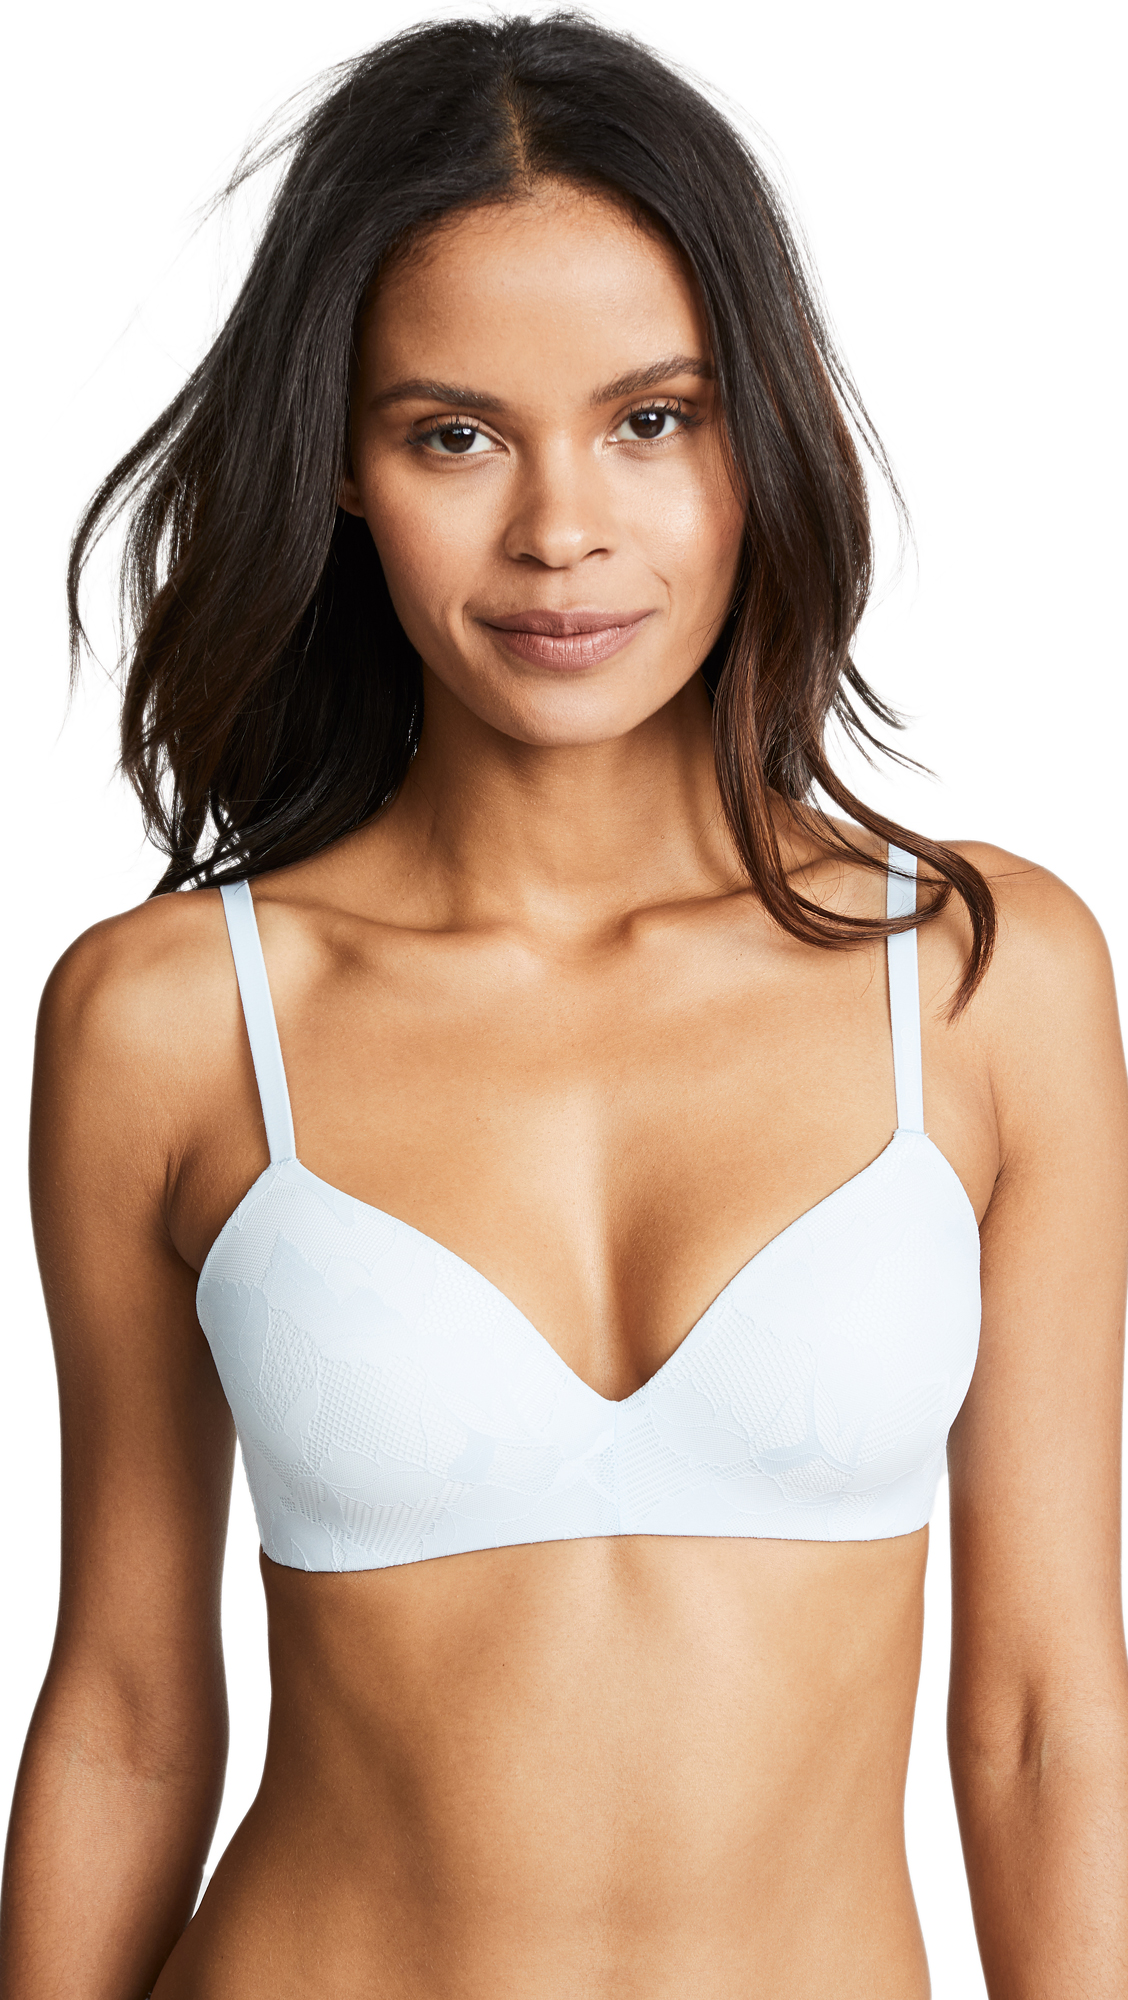 Calvin Klein Underwear Form with Lace Demi Bra In Teardrop